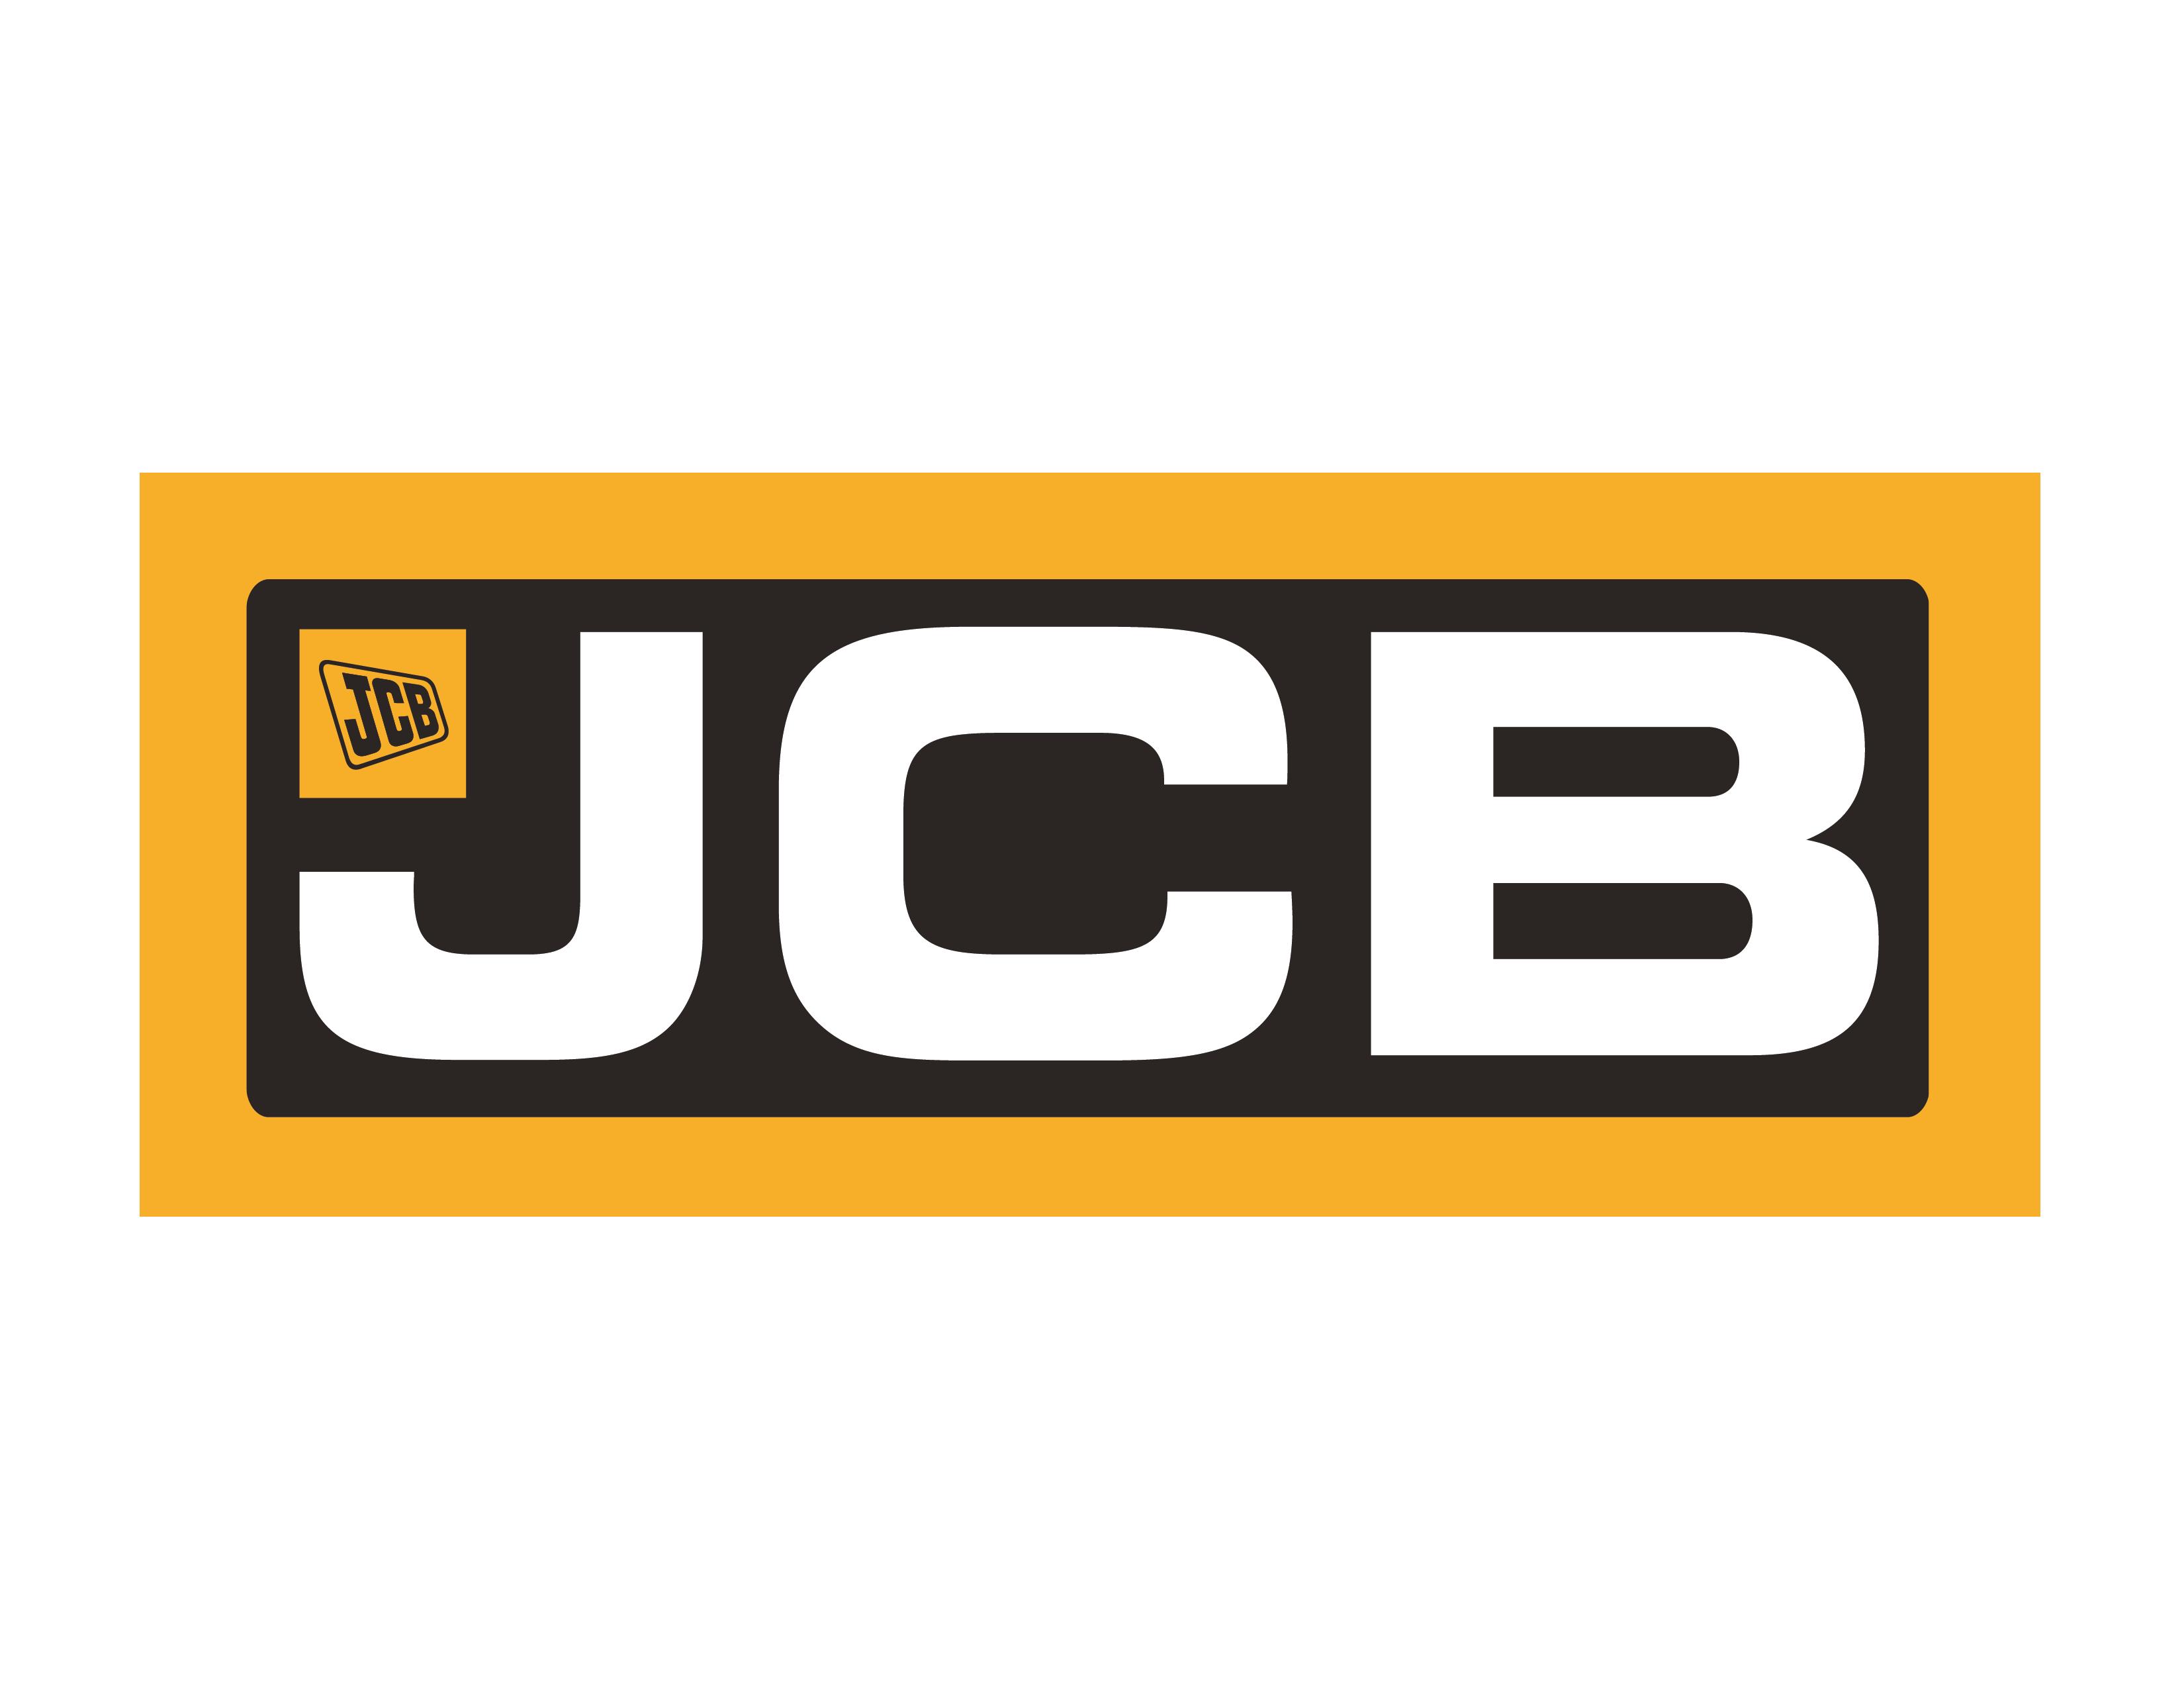 JCB_LOGO-01.png